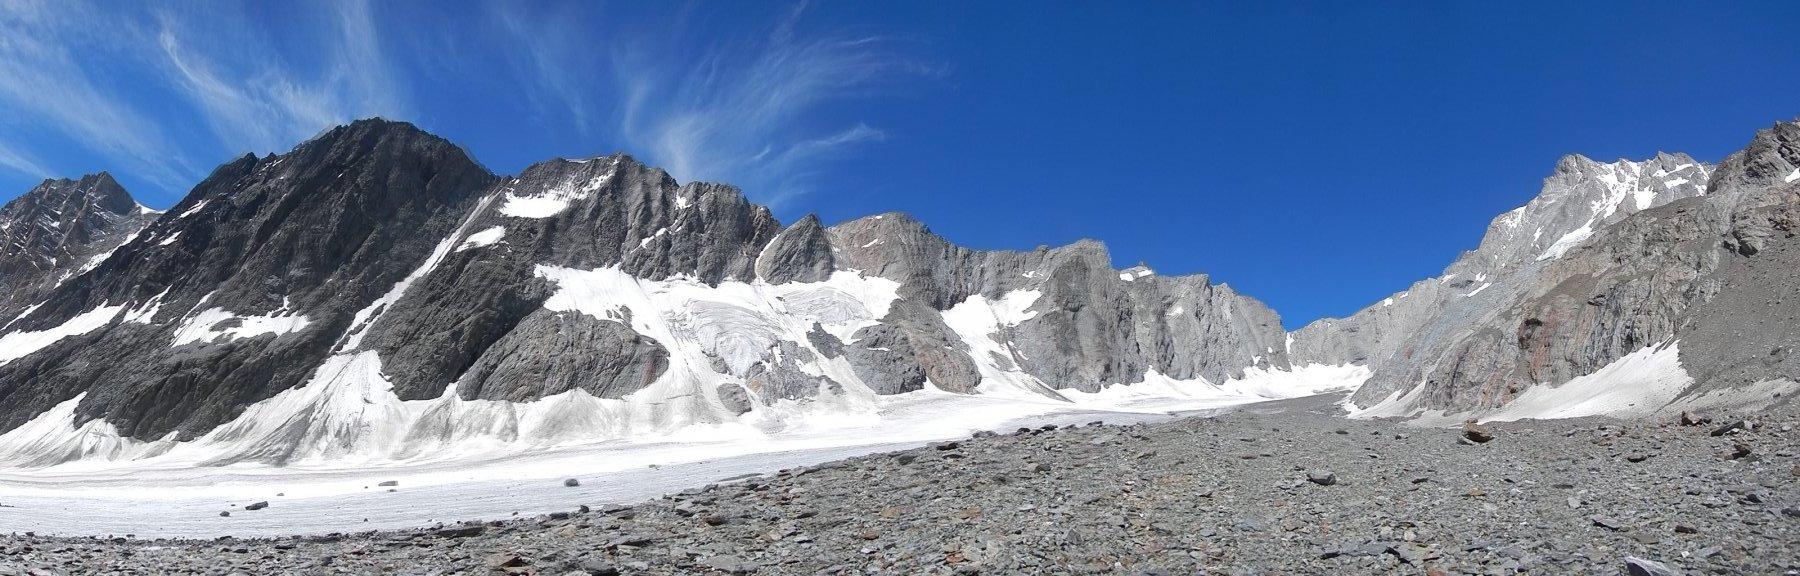 Il bacino dello Strahlegg-gletscher